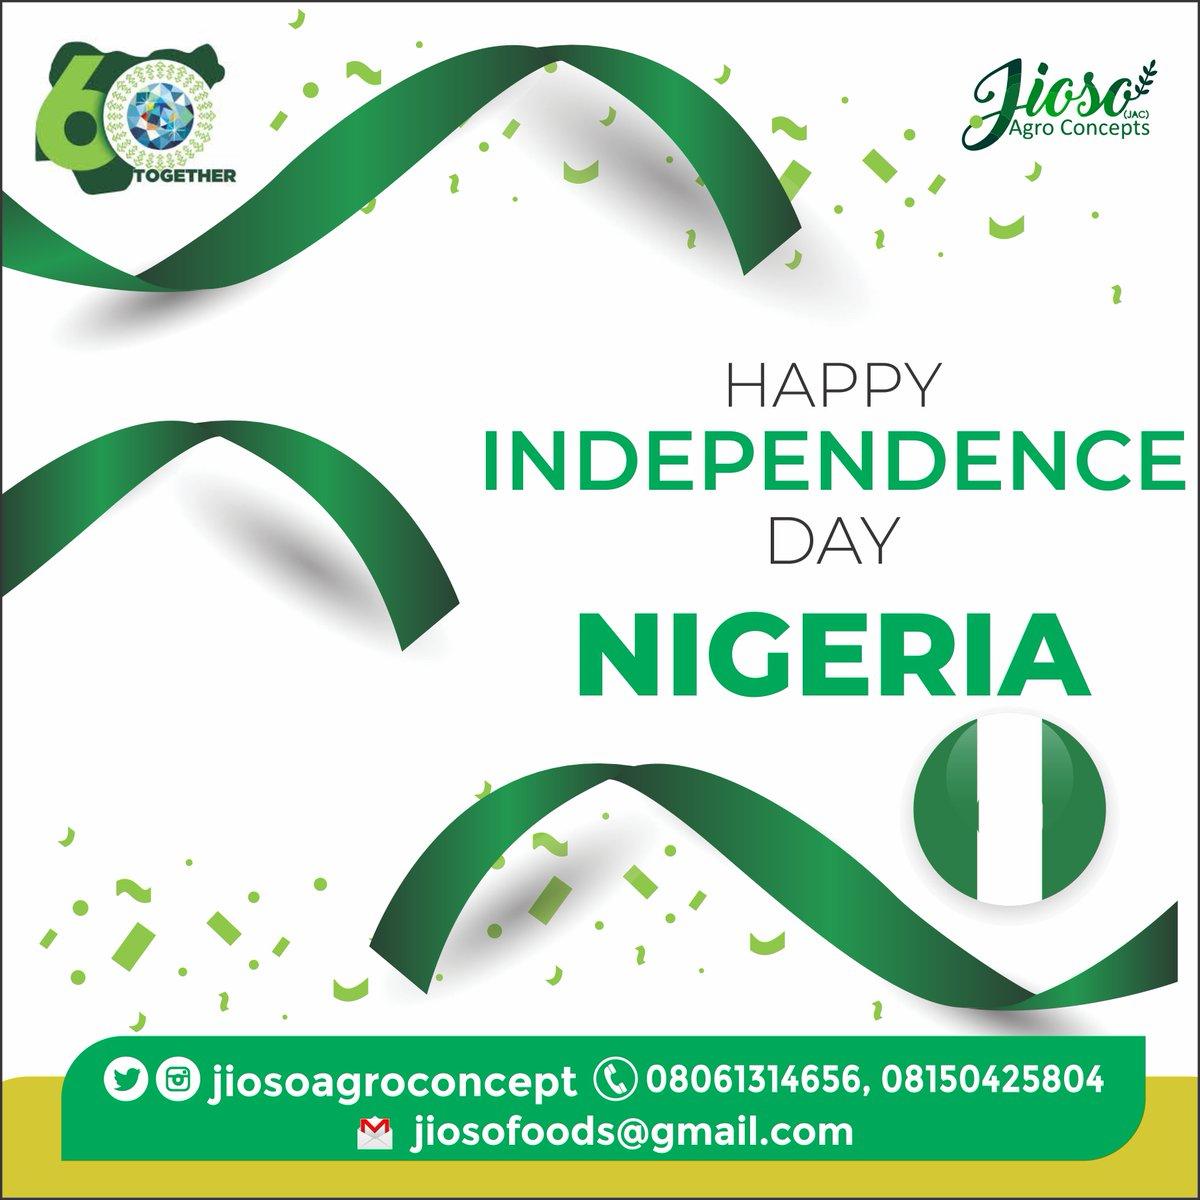 HAPPY INDEPENDENCE DAY NIGERIA!!! #independenceday #thofjuly #october #nigeriaat60 #october #freedom #nigeria #happy #fireworks #love #independence #happyindependenceday #greenwhitegreen #nigerian #instagram #instagood #patriotic #family #summer #celebration #holiday #bhfyp https://t.co/MKVSMWcUe2